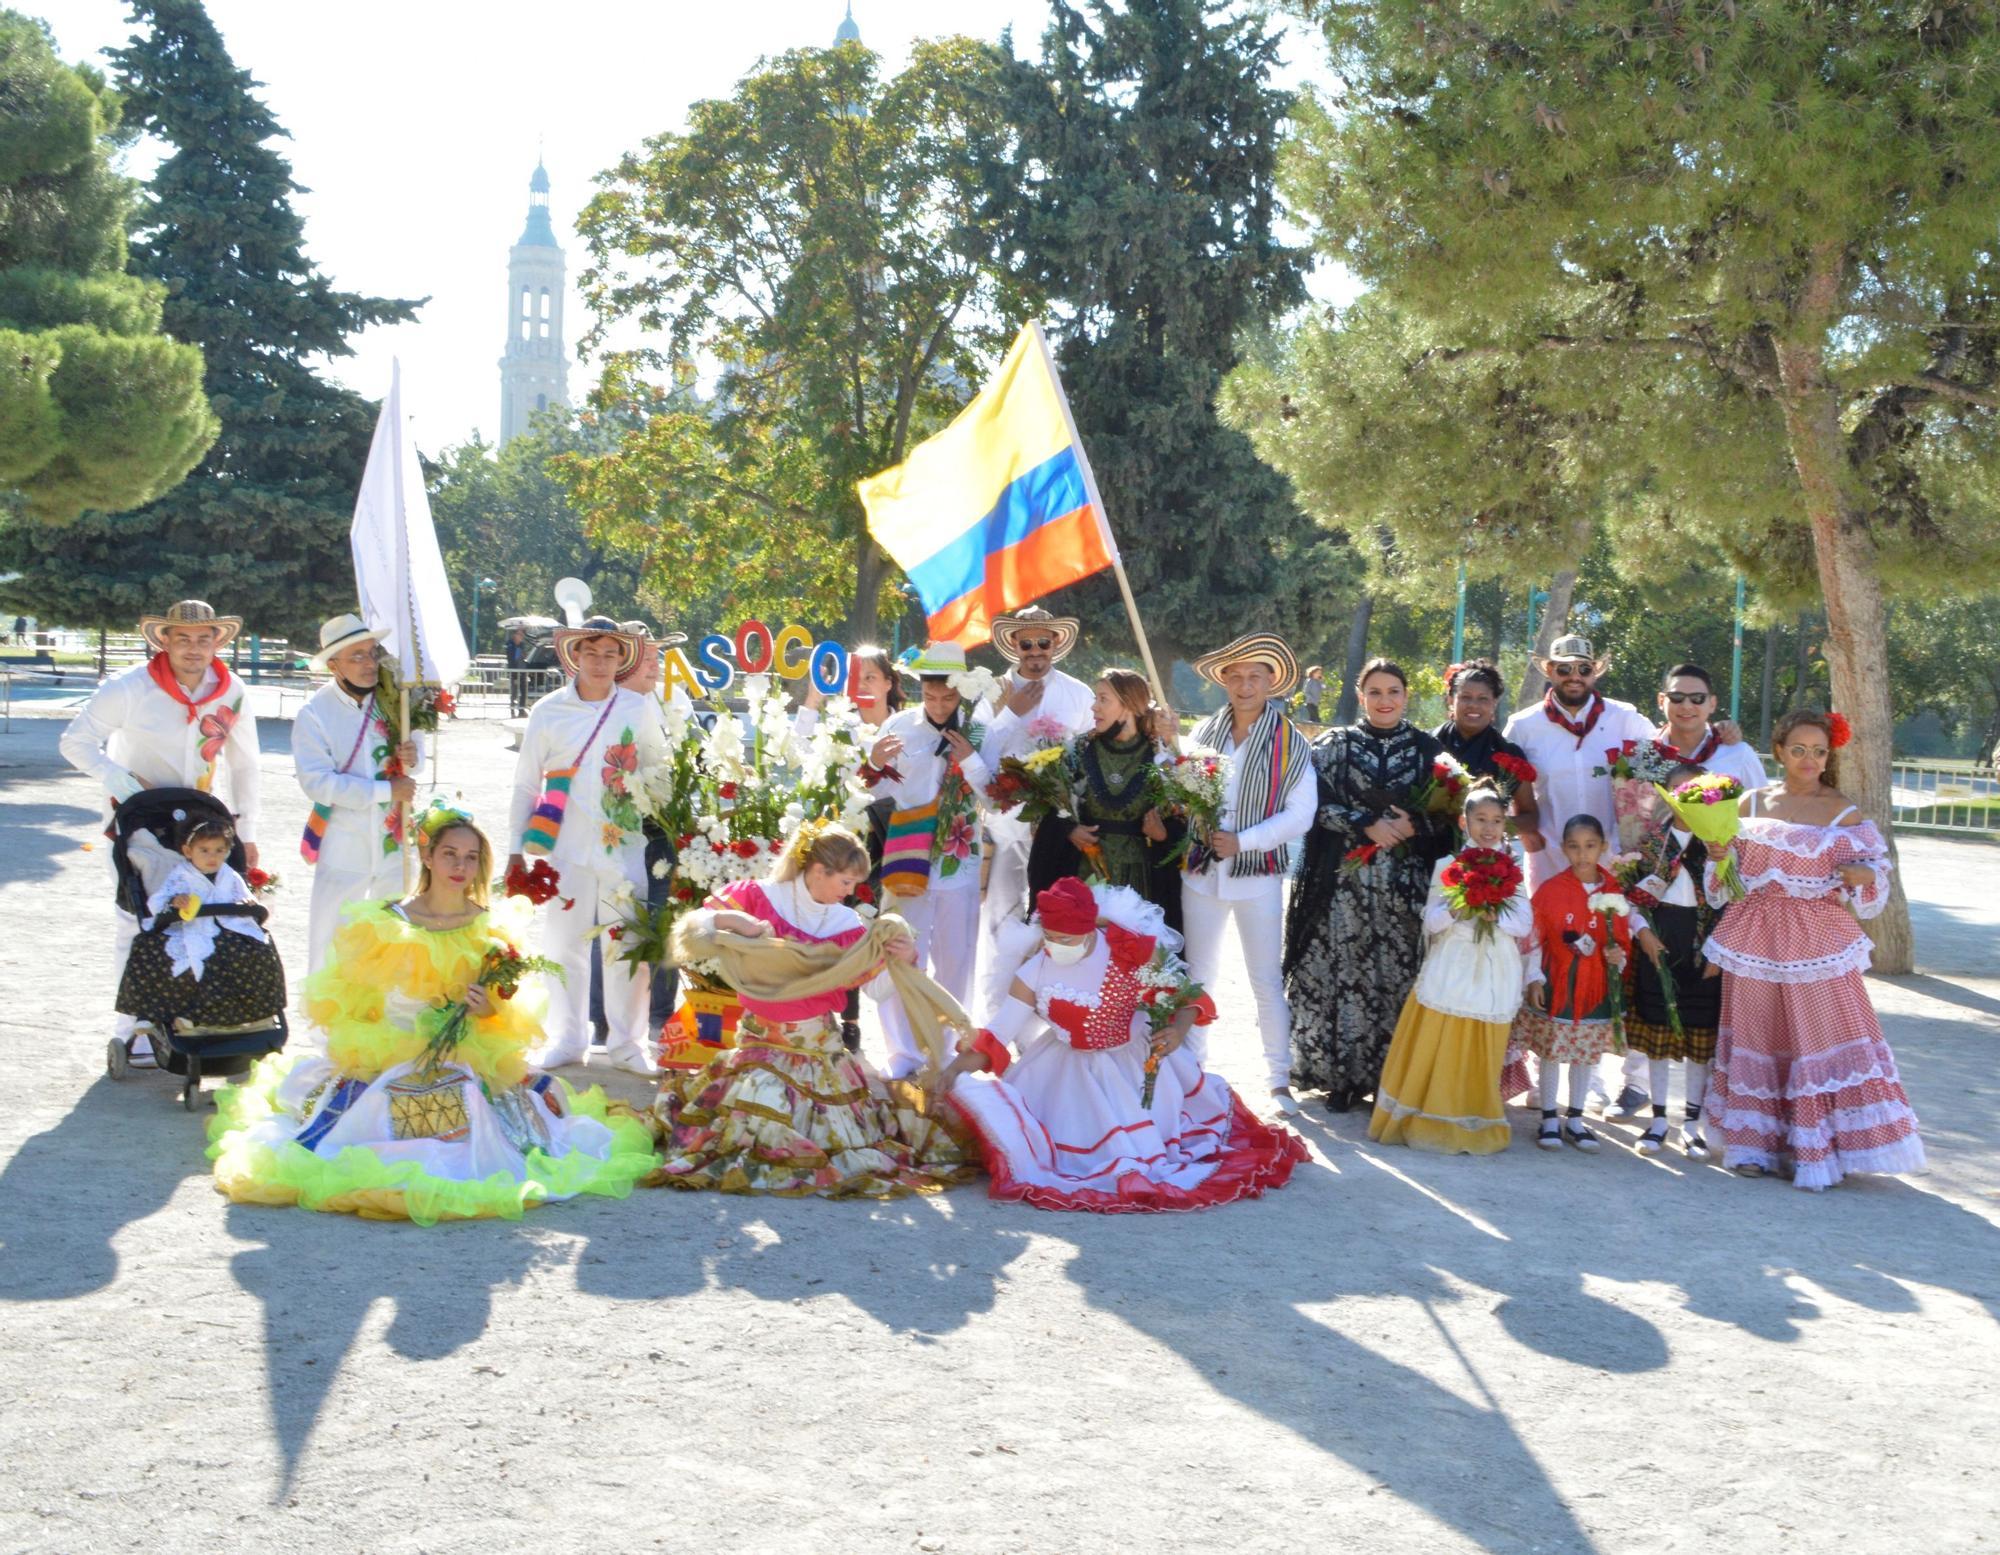 Mª PILAR SEVILLA Y ASOCOL (COLOMBIA)